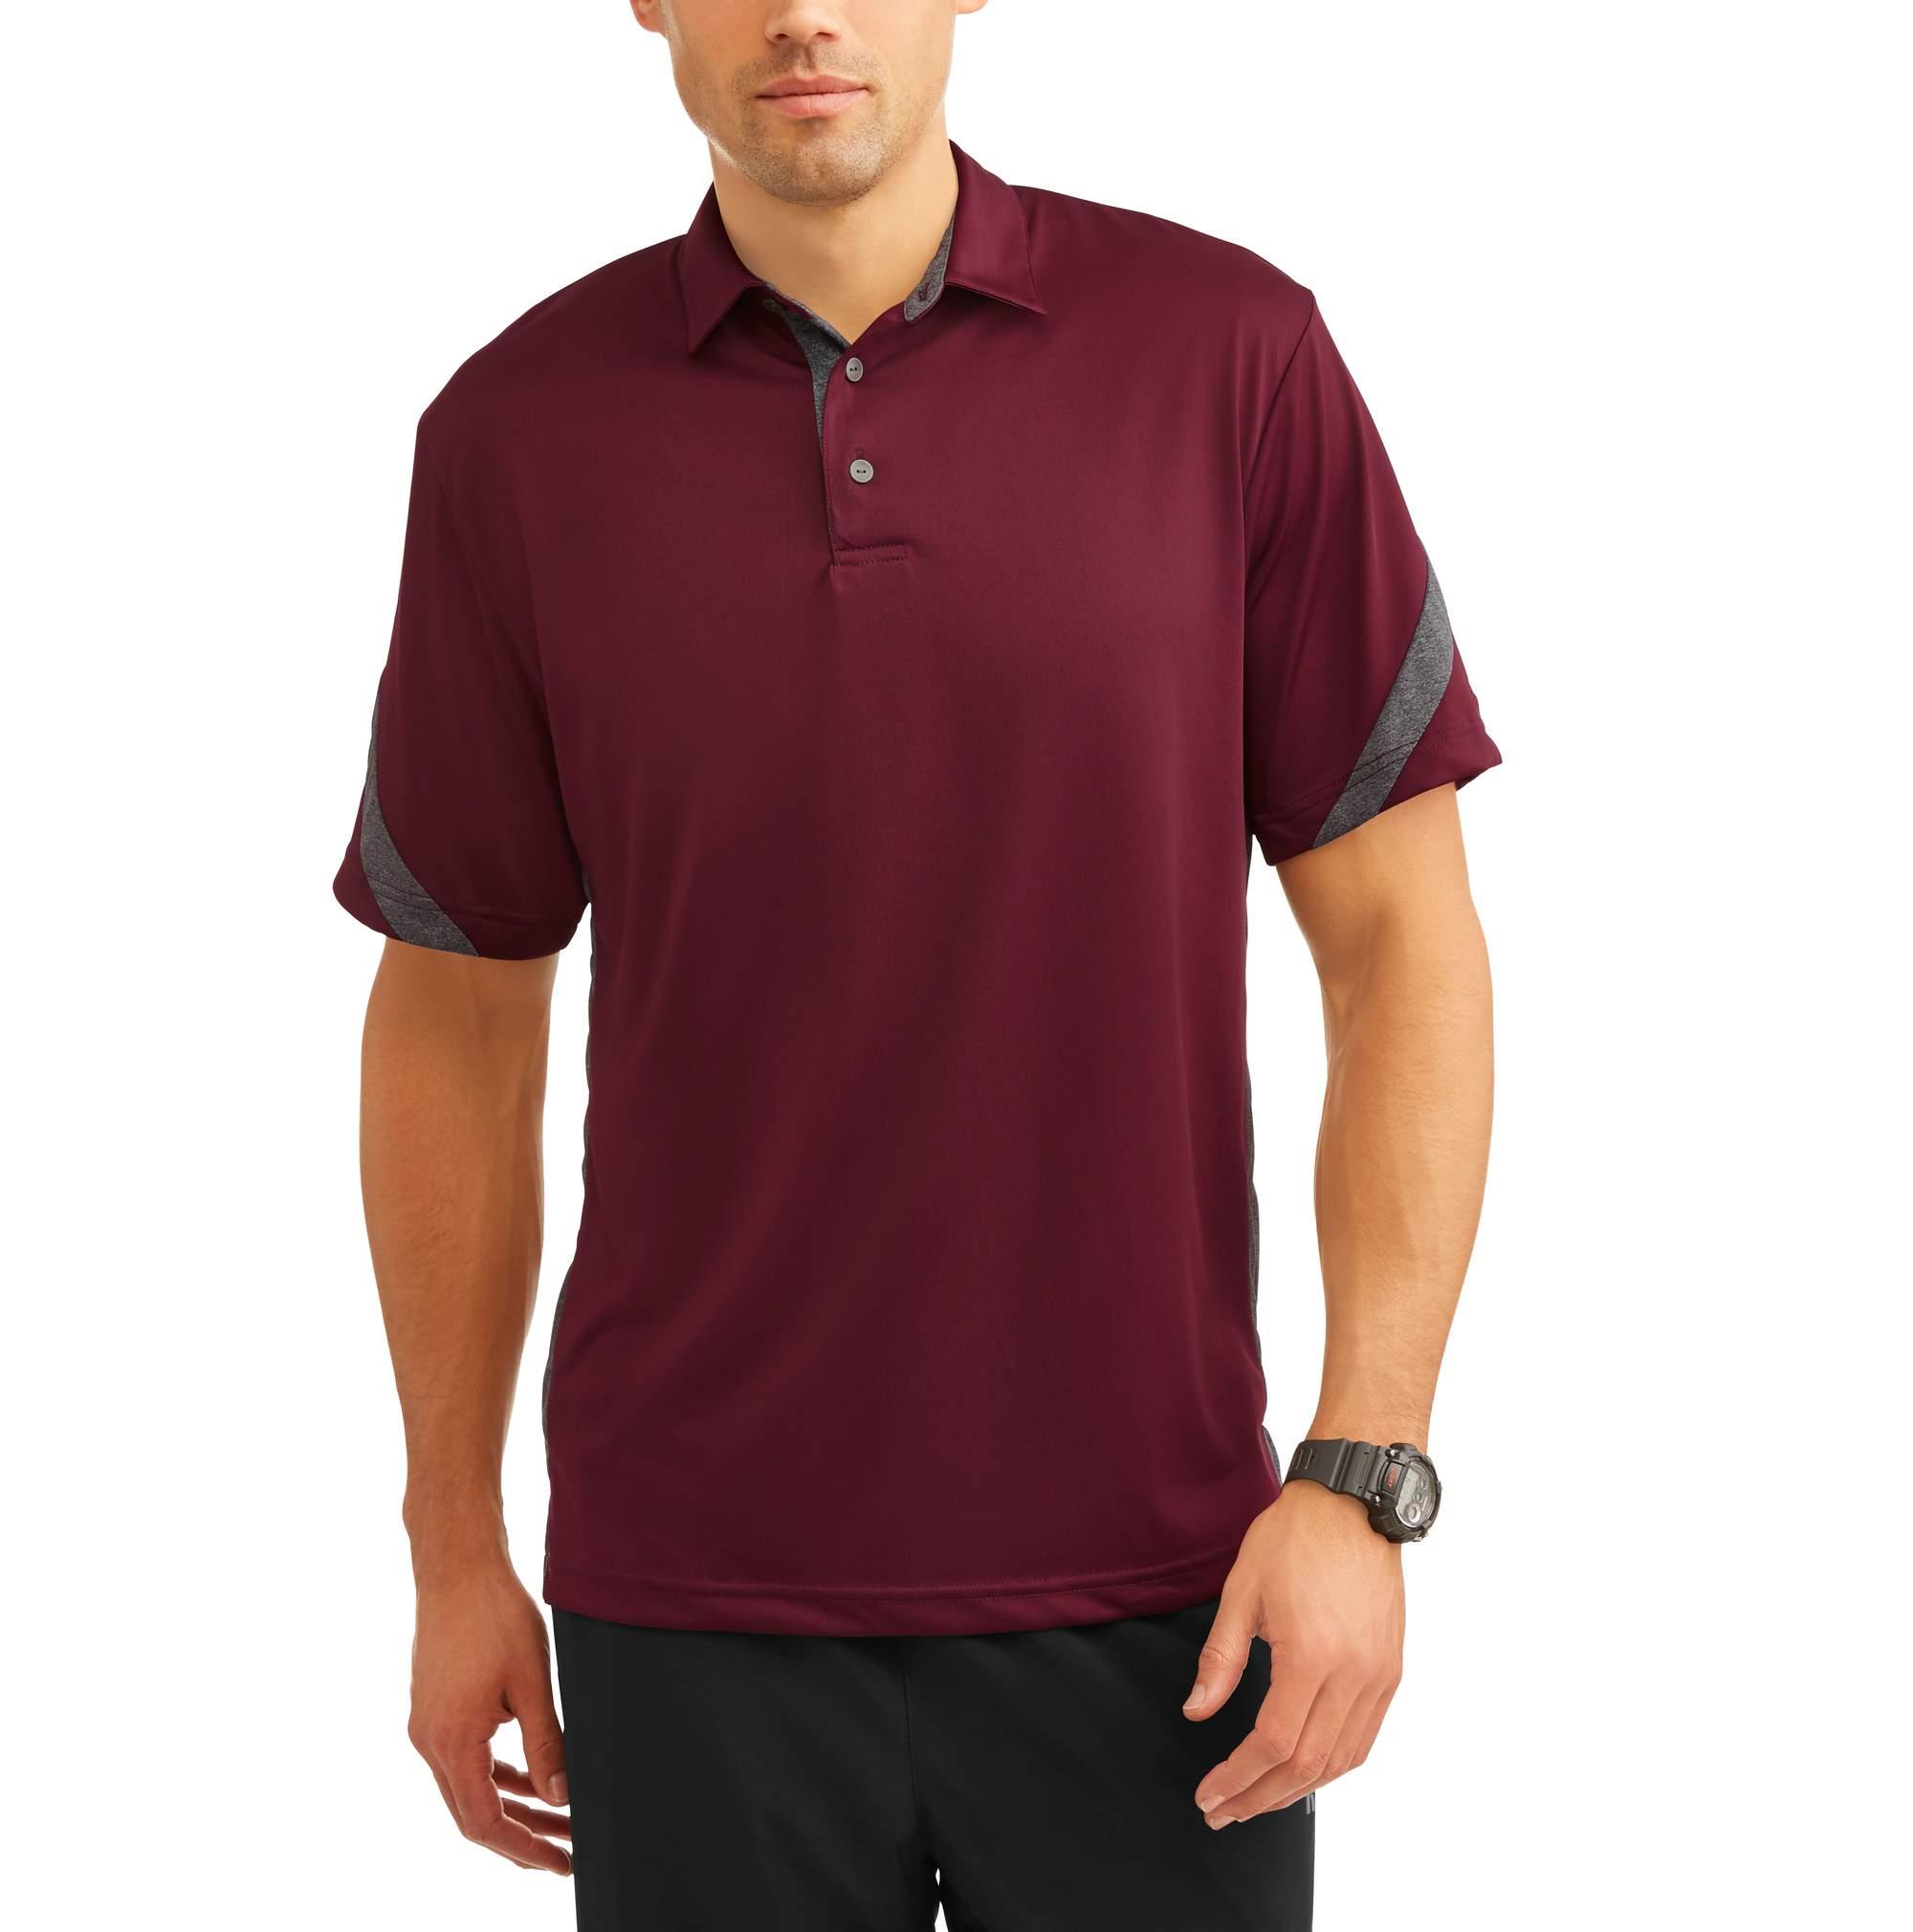 Men's Performance Short Sleeve Color Block Polo Shirt